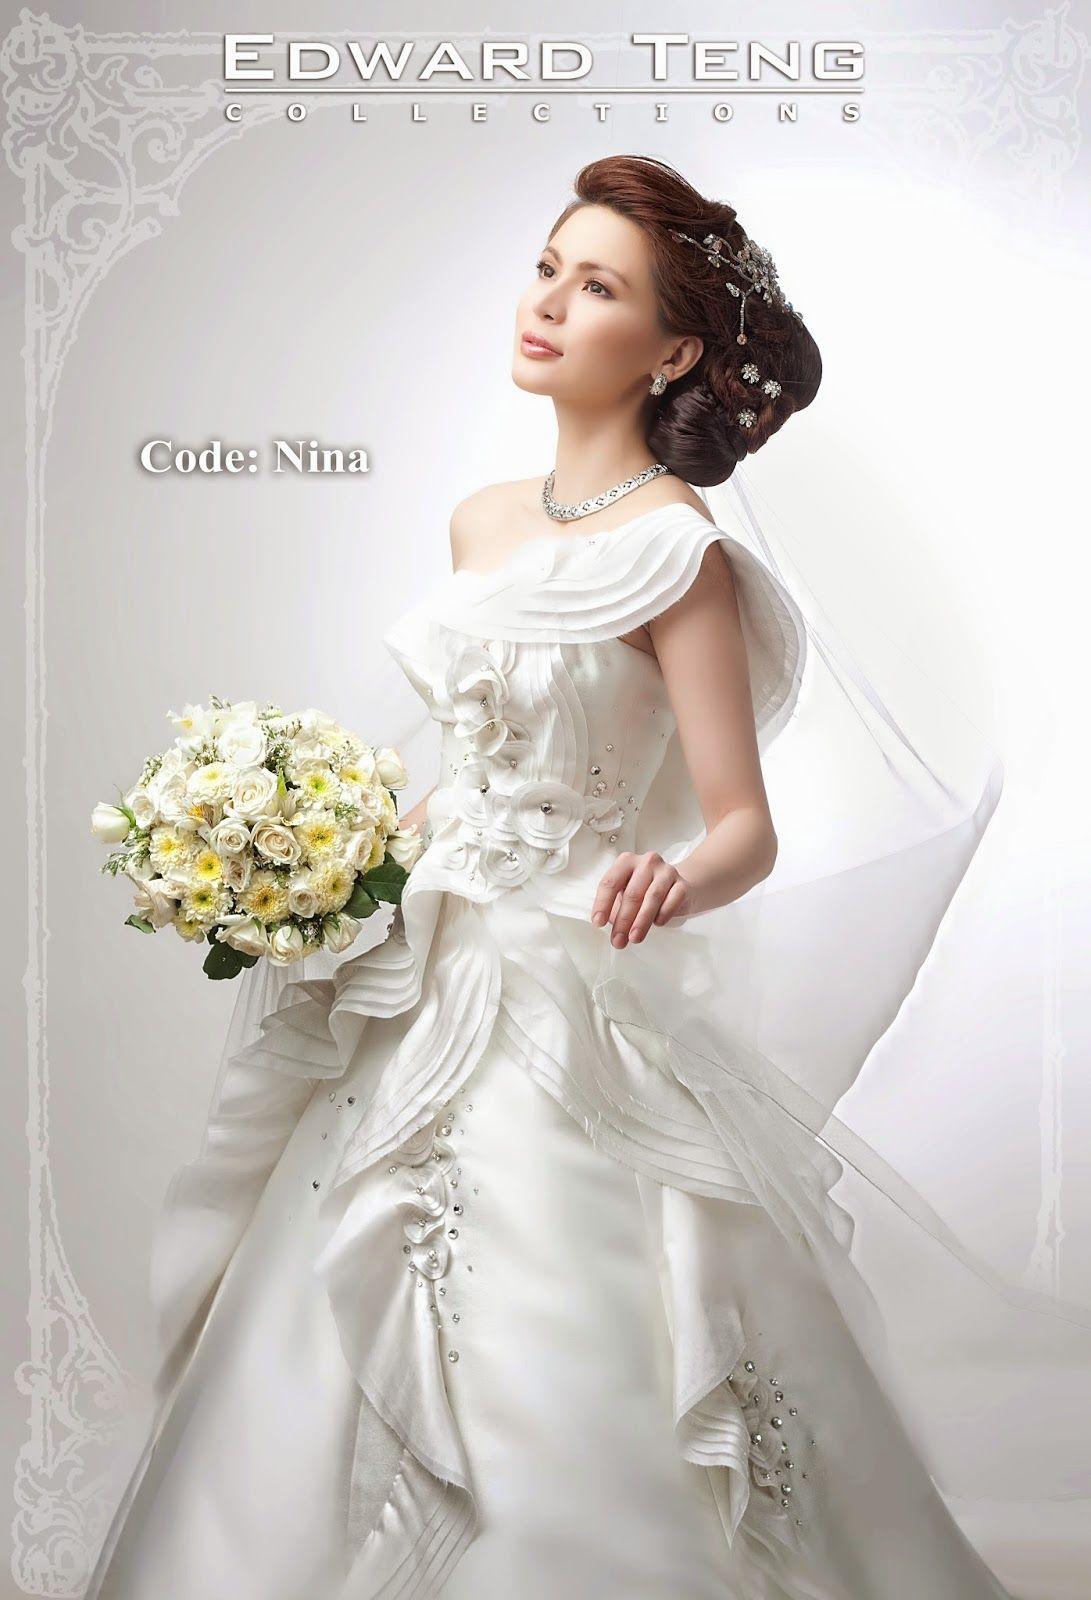 Philippines Bridal Gown Designer (Edward Teng) Designer